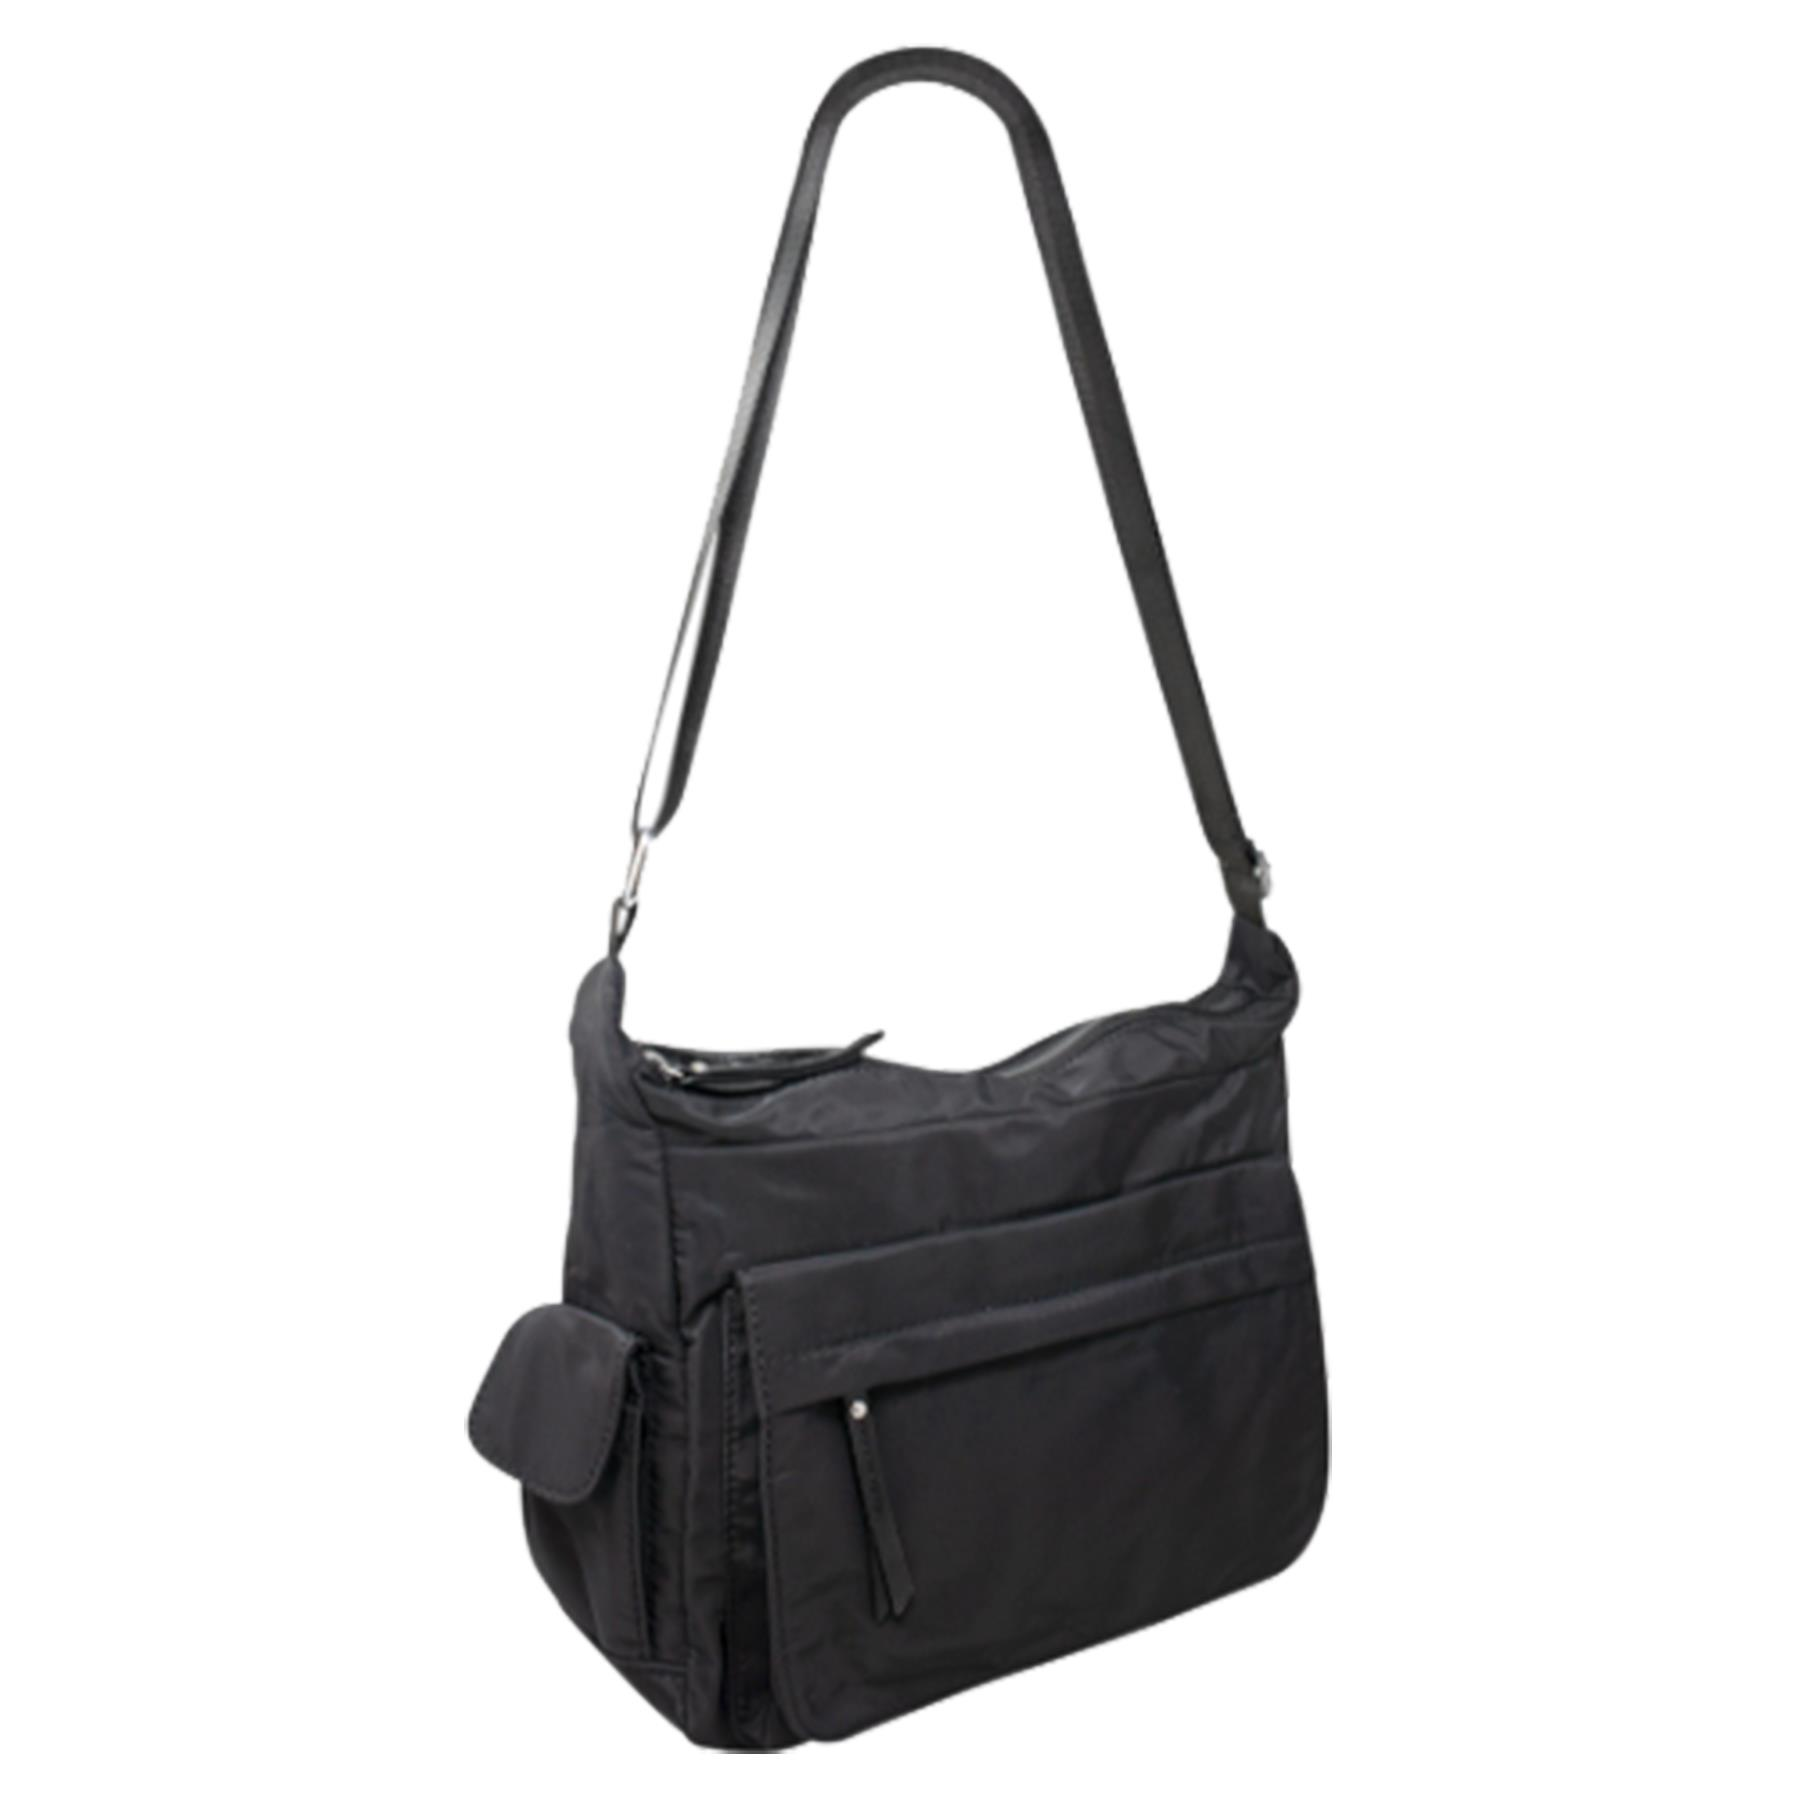 New-Ladies-Men-s-Showerproof-School-College-Practical-Basic-Crossbody-Bag thumbnail 3